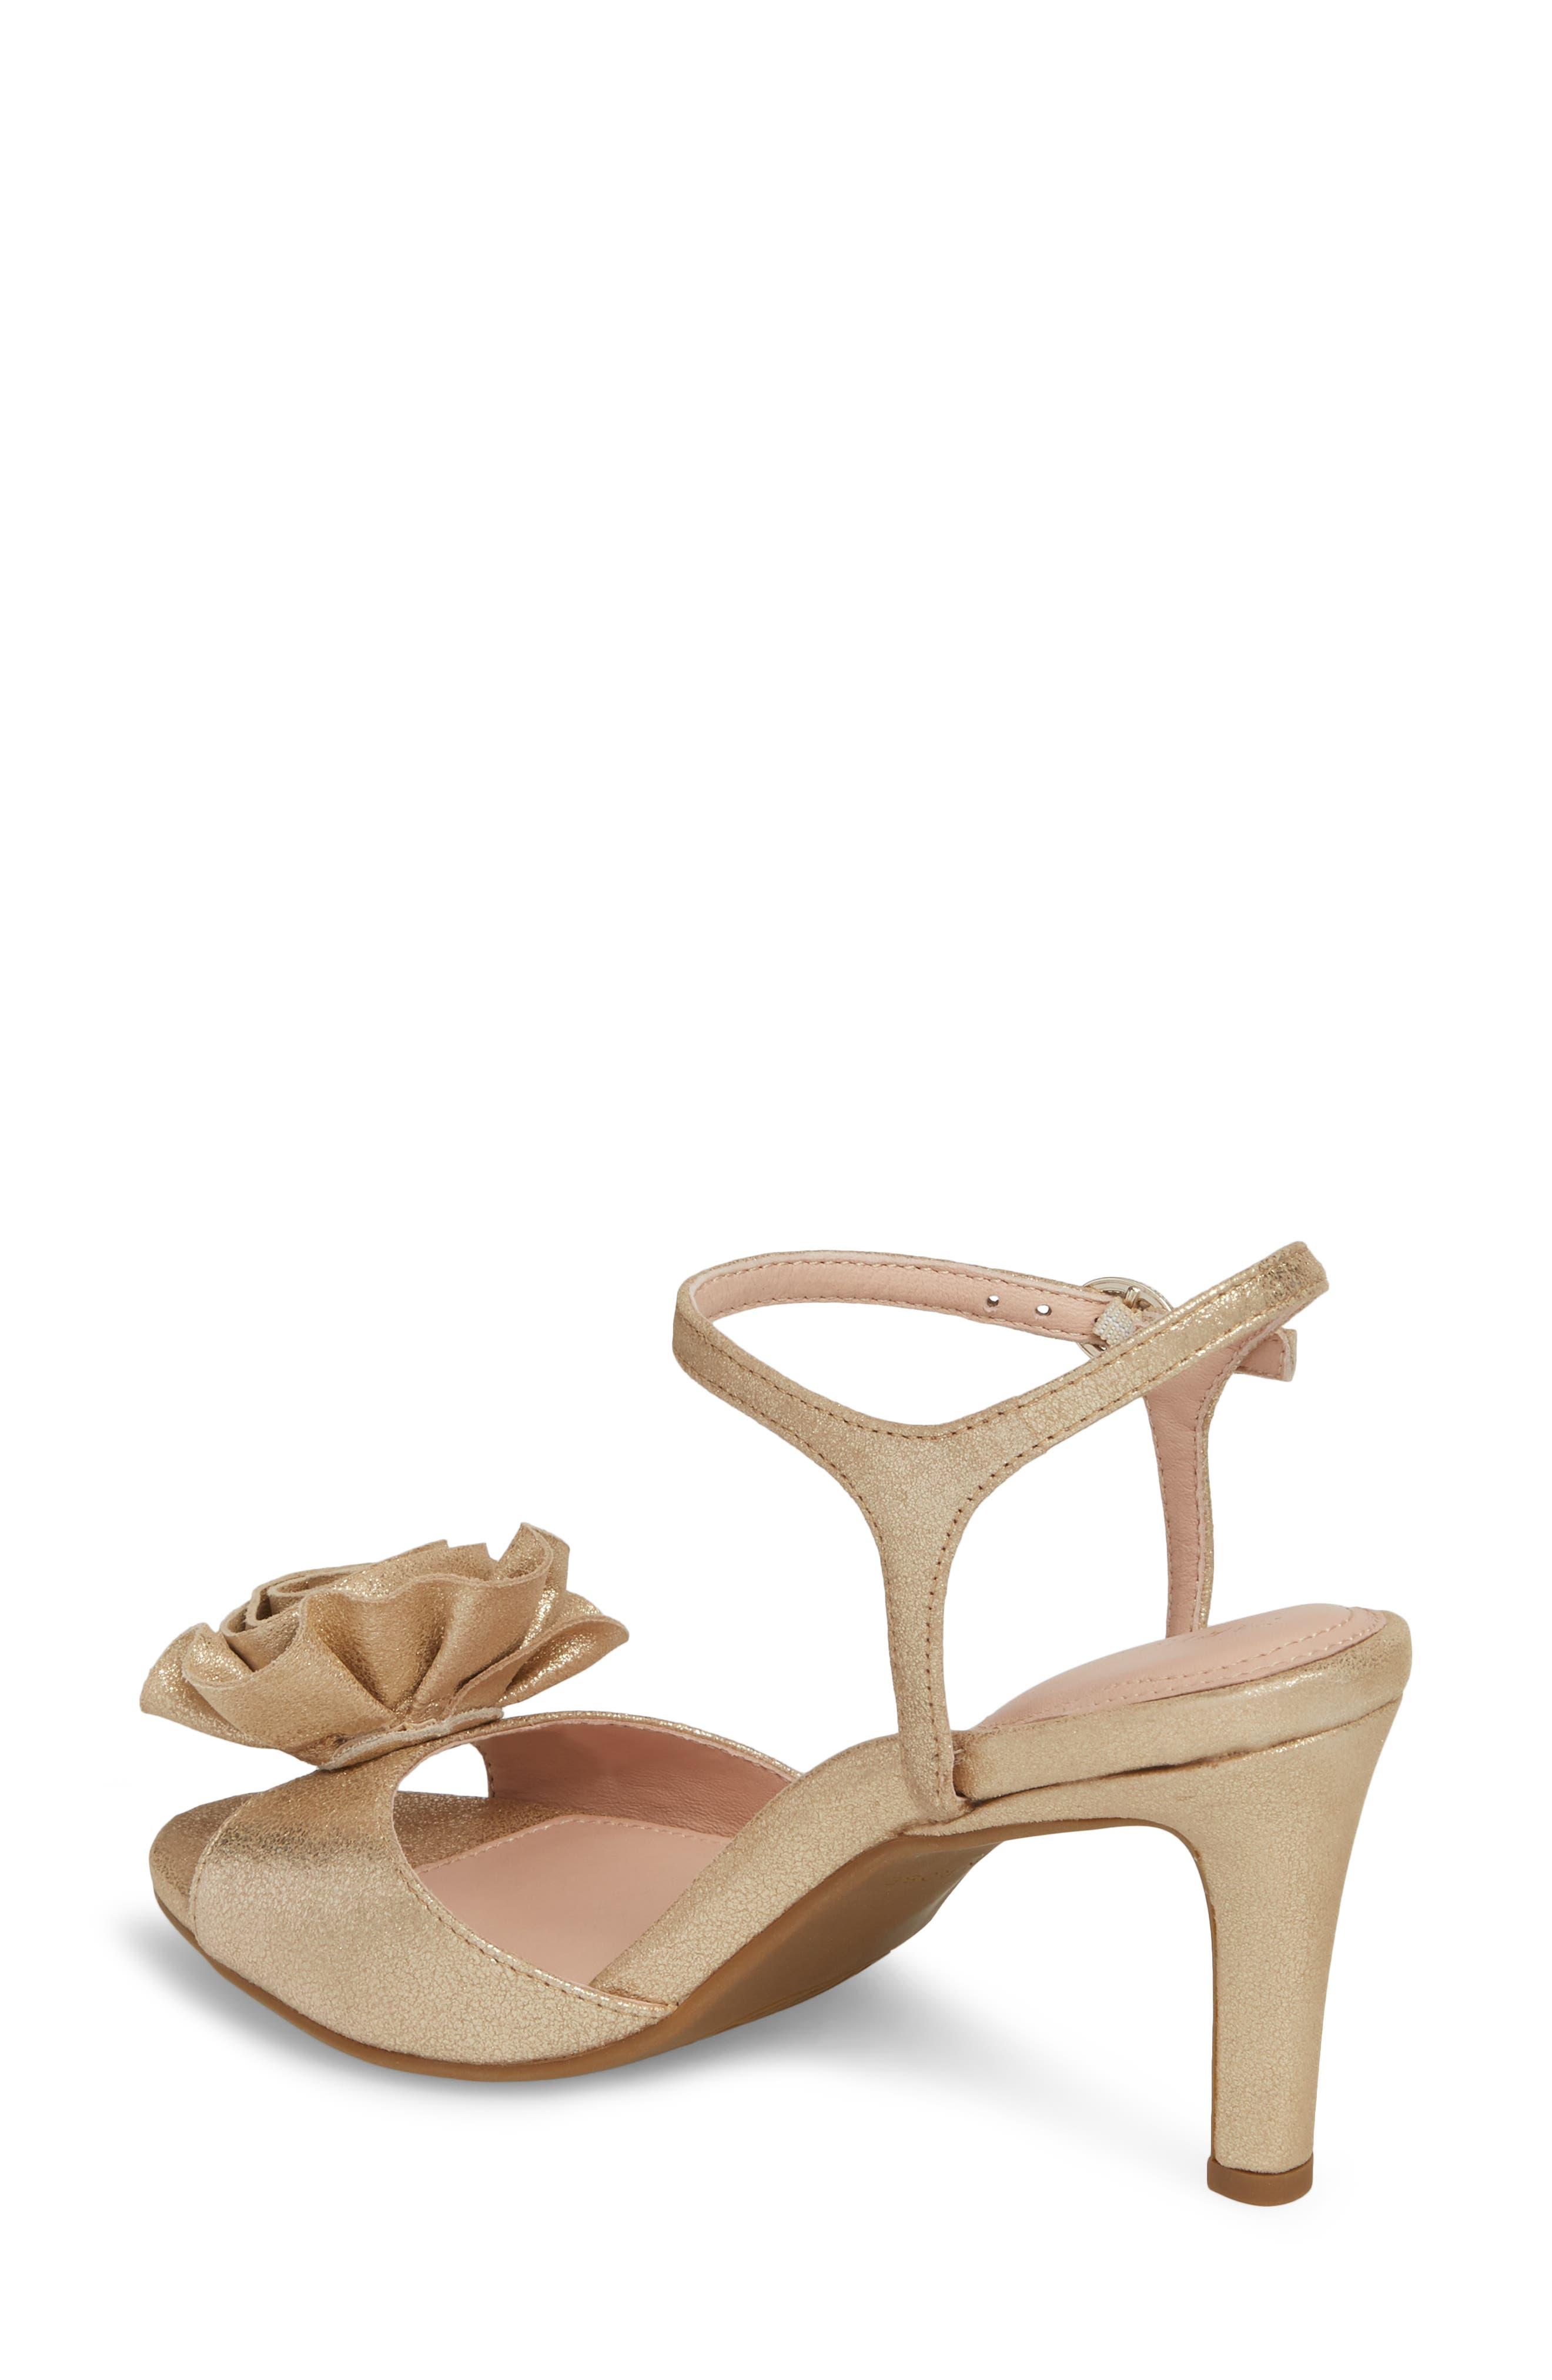 Jacklyn Flower Sandal,                             Alternate thumbnail 2, color,                             Gold Shimmer Fabric